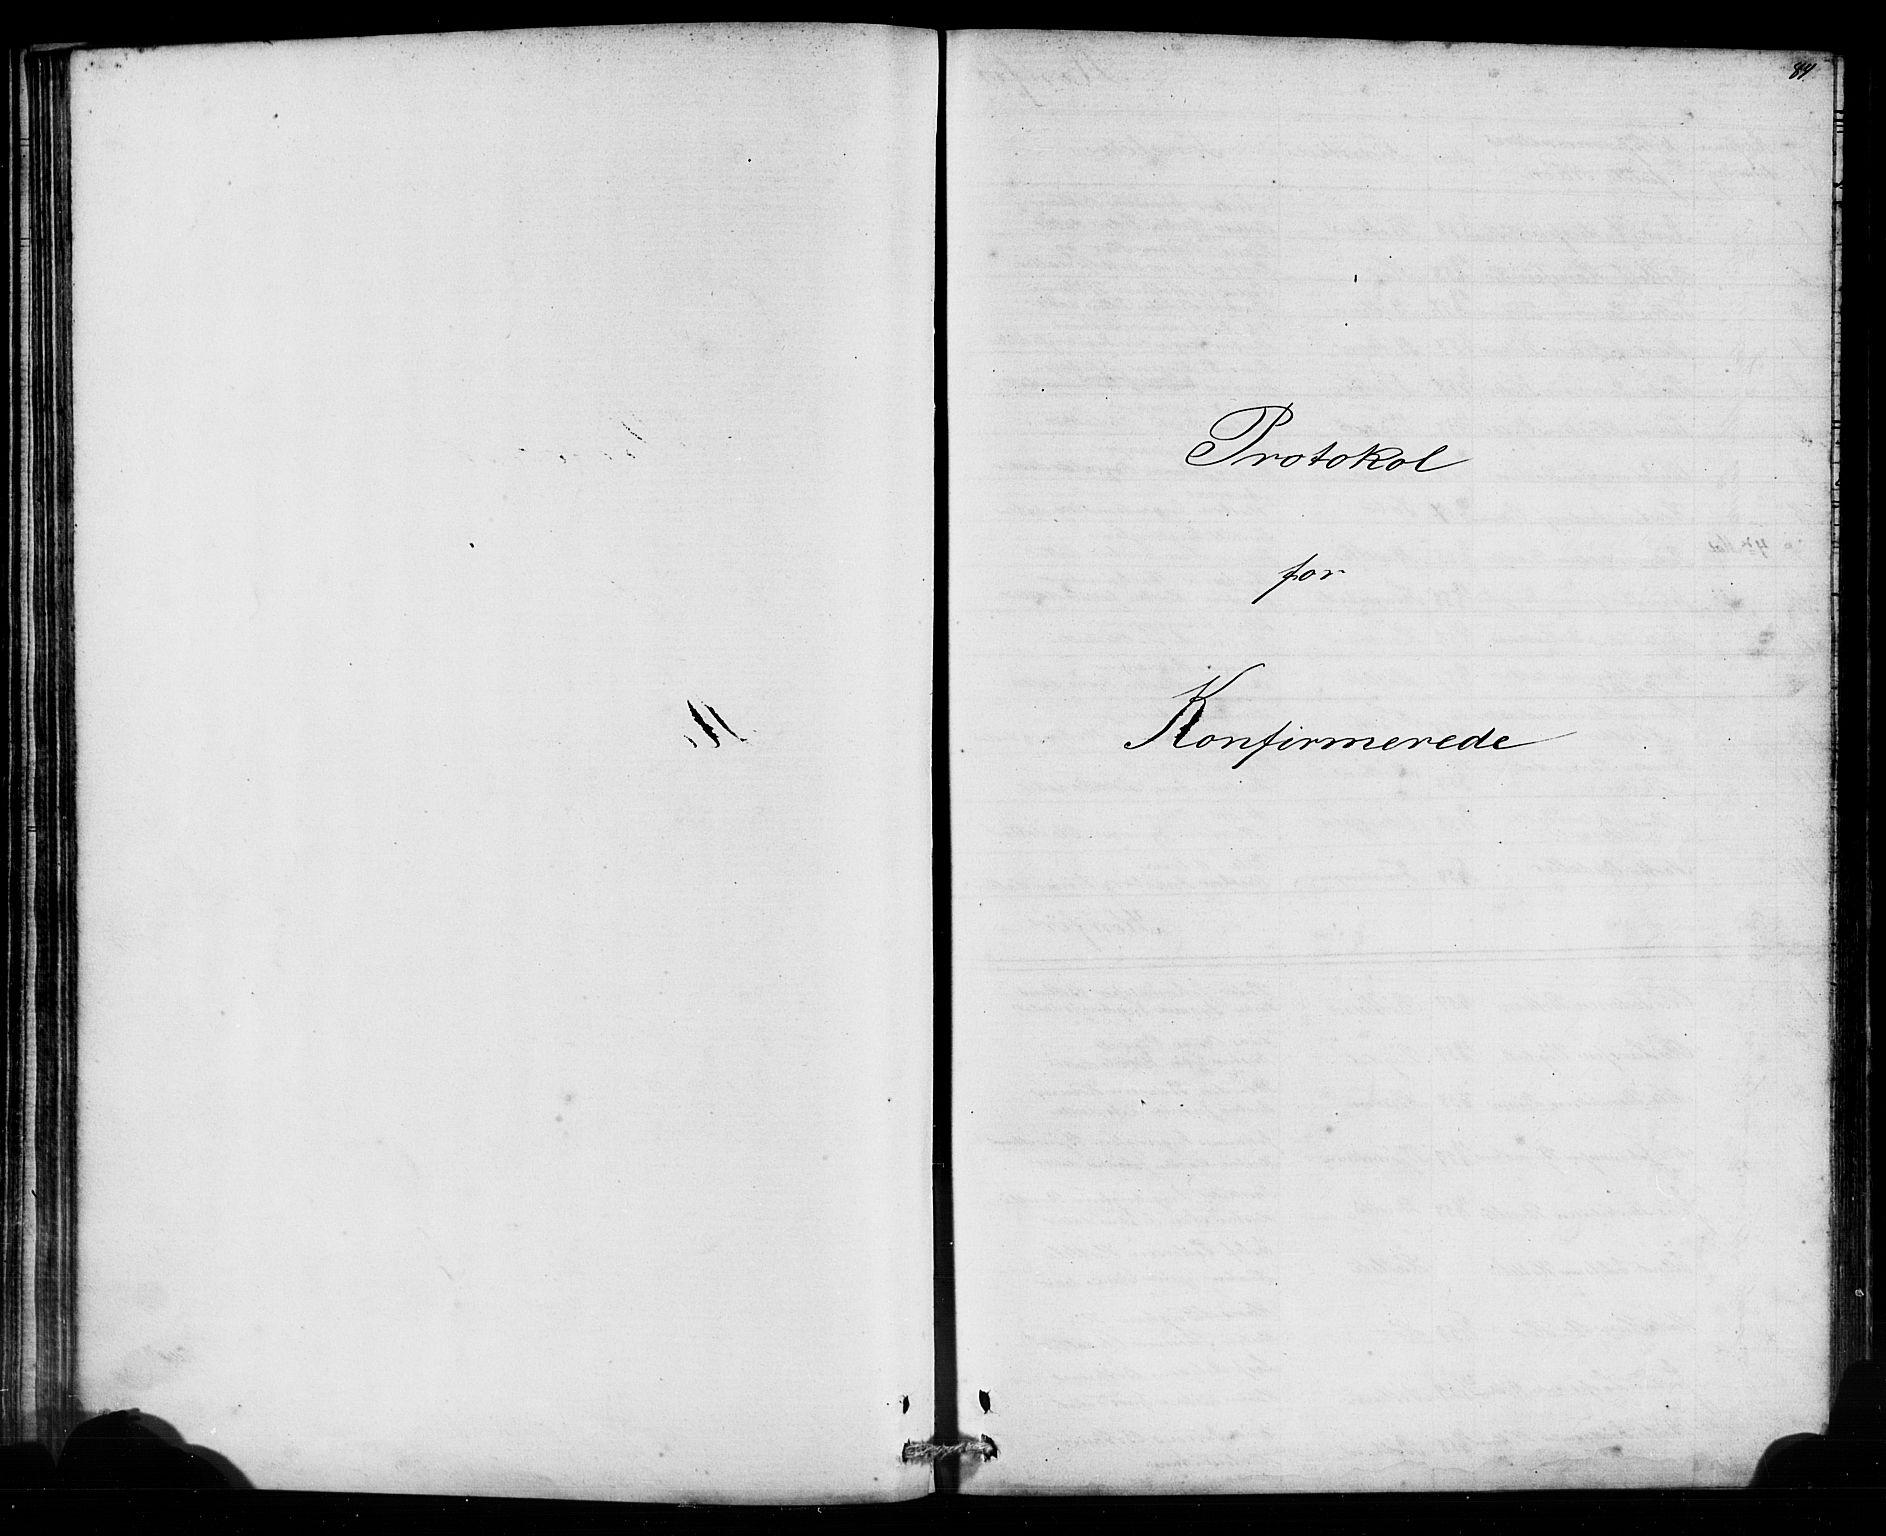 SAB, Leikanger Sokneprestembete, Klokkerbok nr. B 1, 1873-1908, s. 84